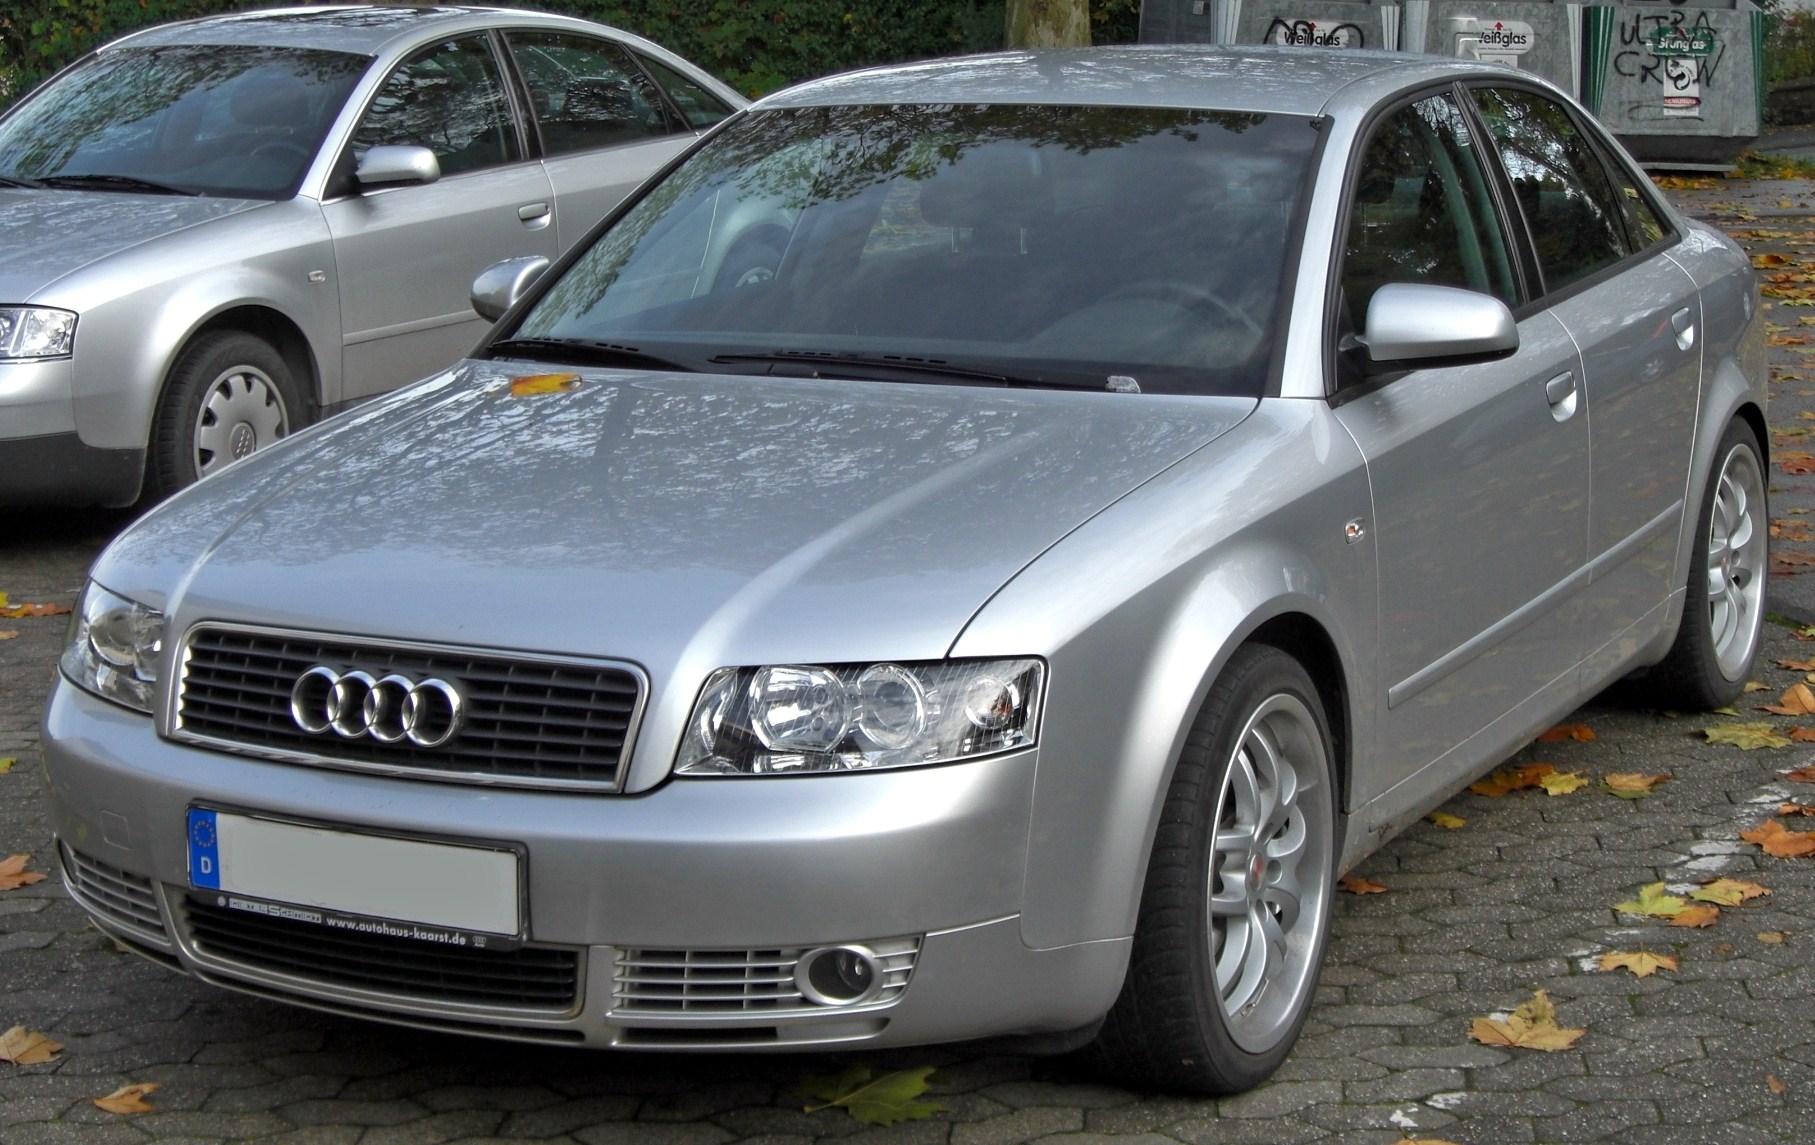 Audi_A4_B6_(2000%E2%80%932004)_front_MJ.